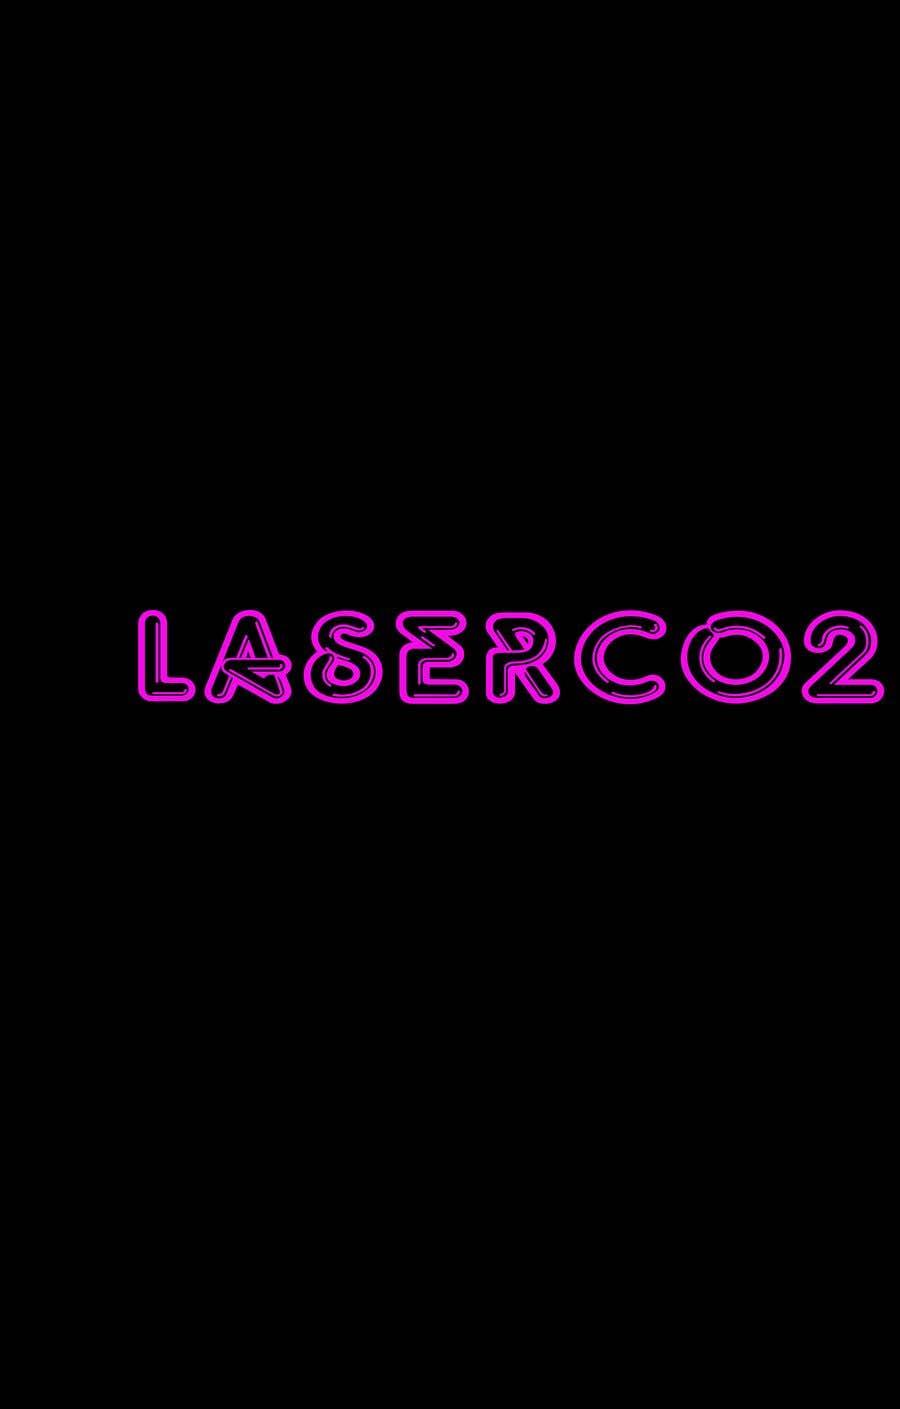 Konkurrenceindlæg #                                        32                                      for                                         logo for laser cutting/engraving and uv printing business